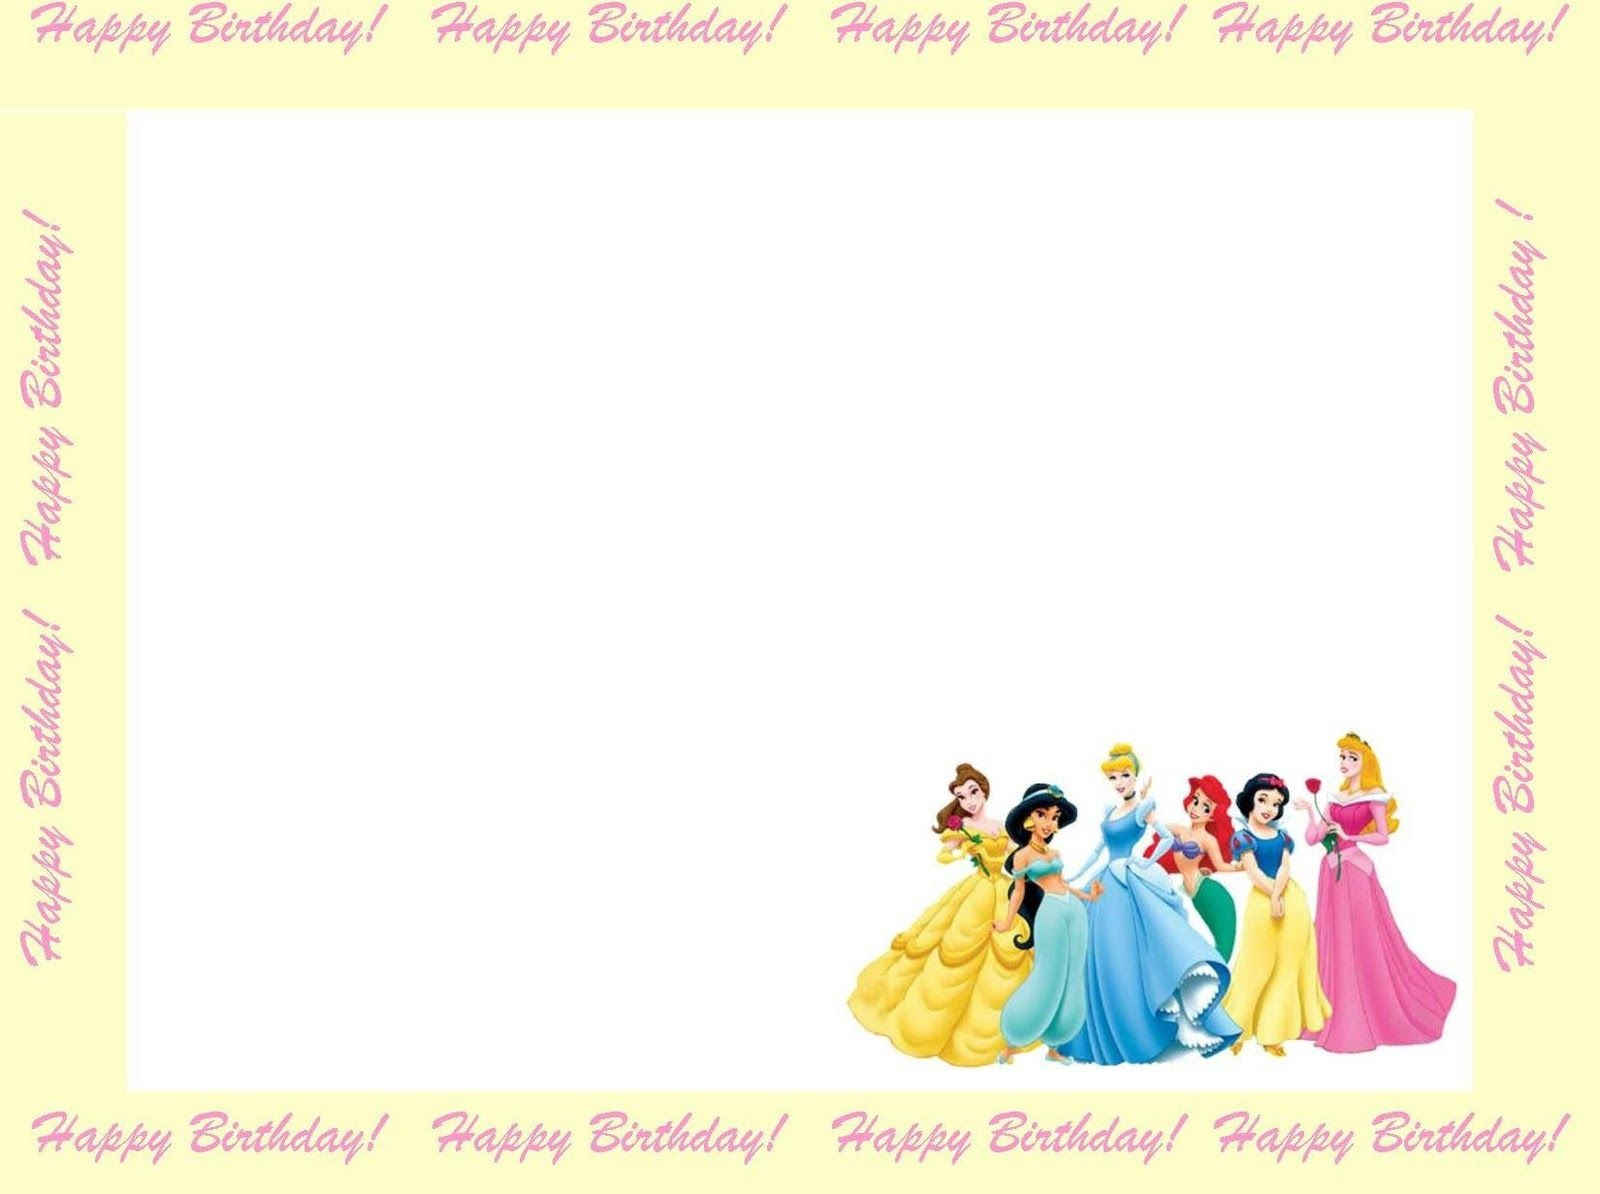 Free Princess Invitations To Print | Free Printable Disney Princess - Free Printable Princess Invitations